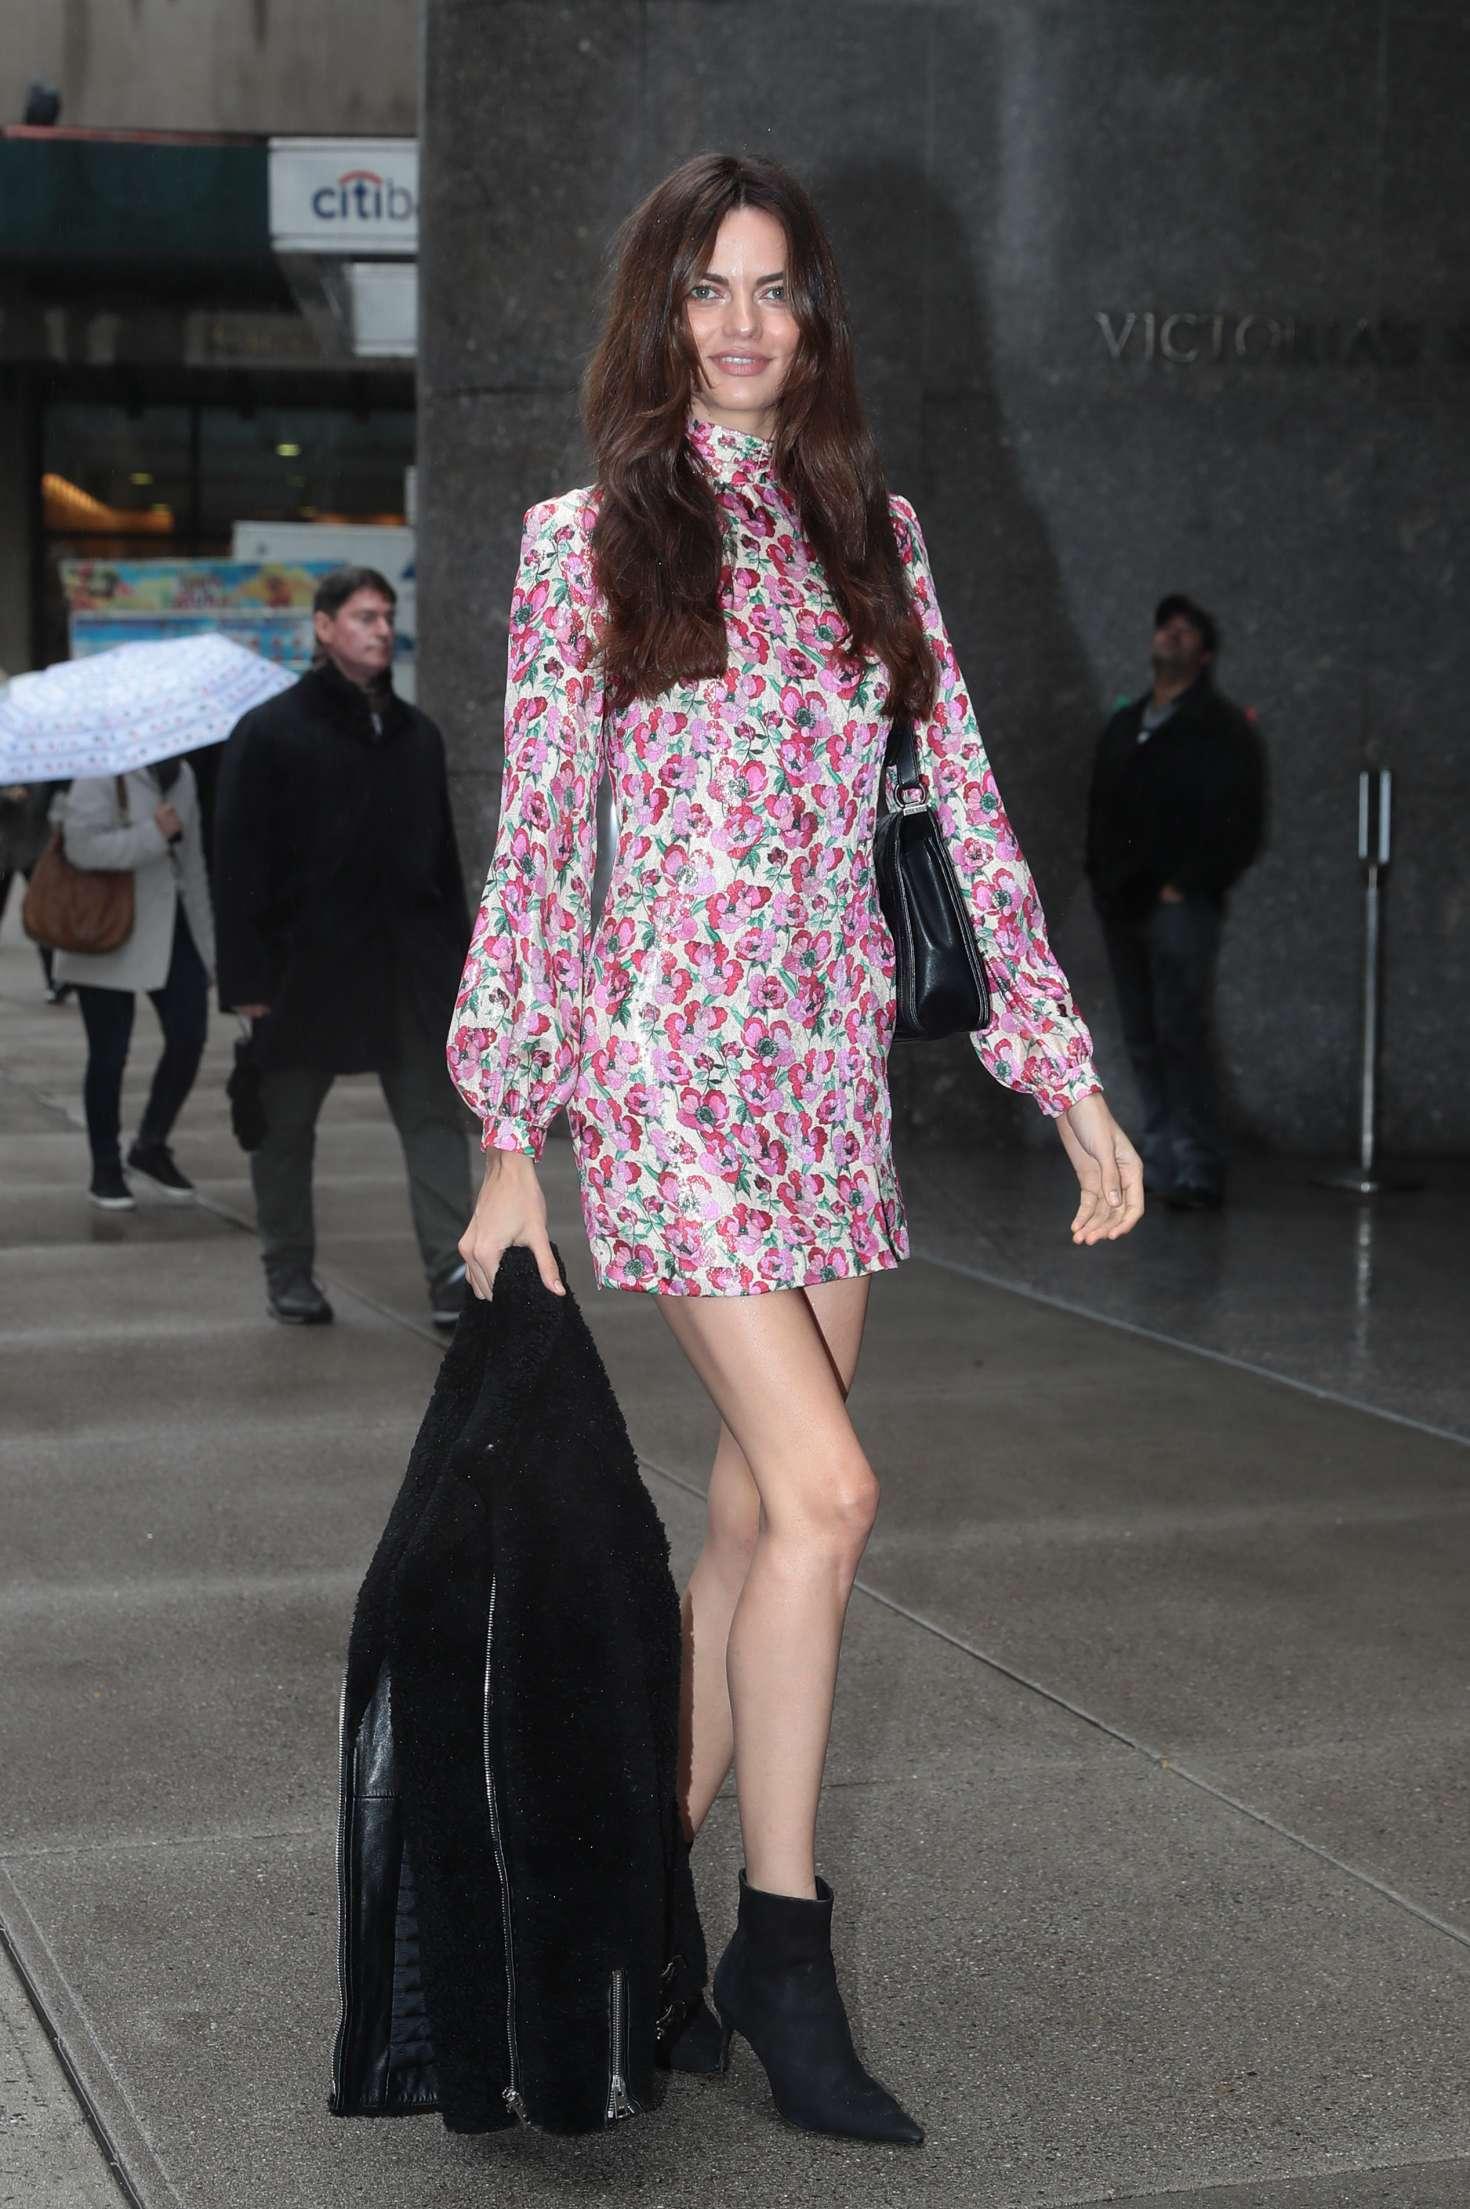 Barbara Fialho 2018 : Barbara Fialho: Victorias Secret Fittings in New York -08